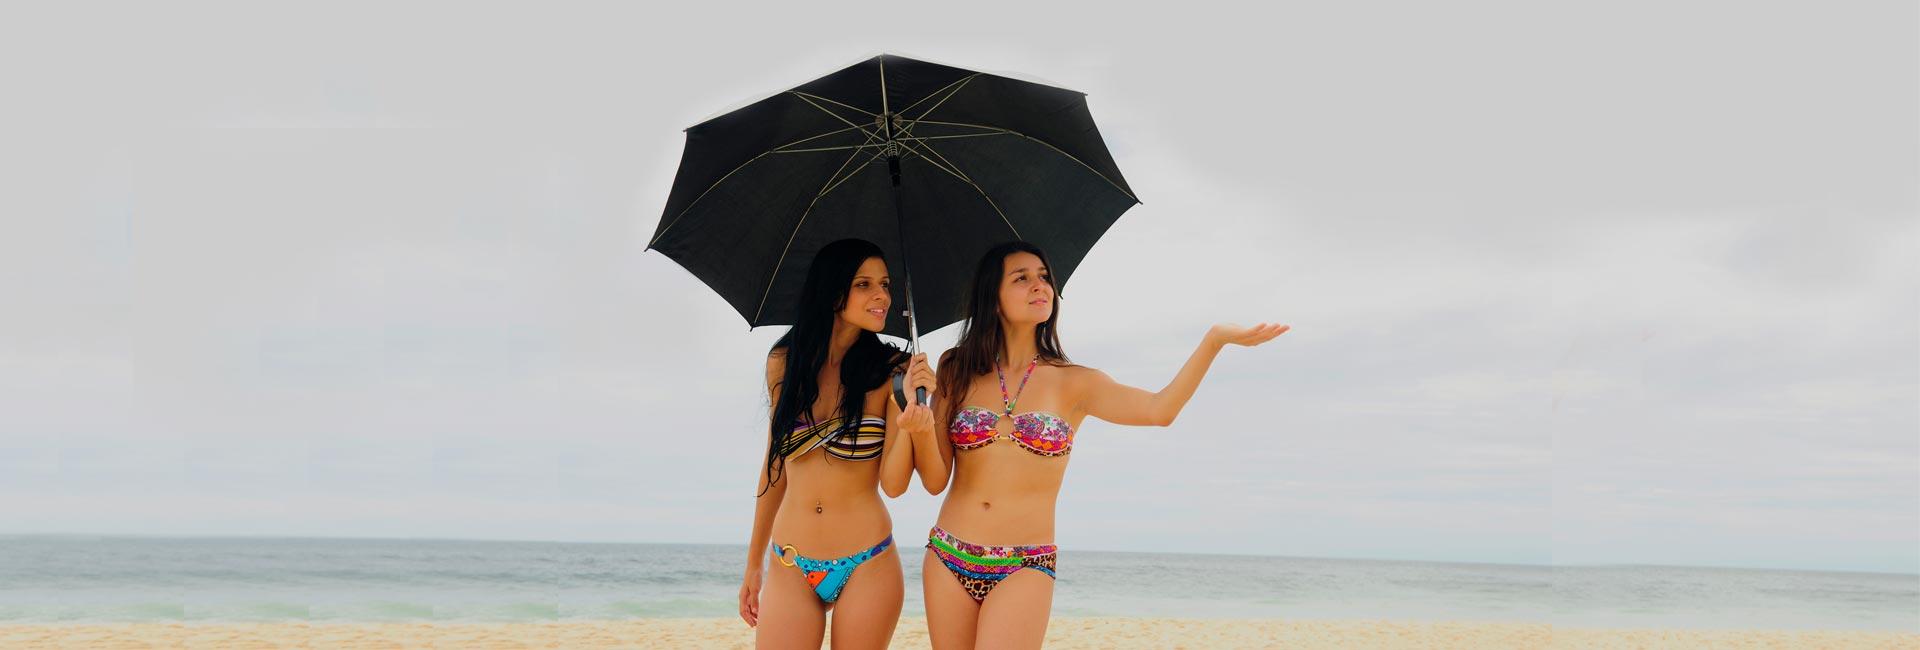 Optimizada two women with umbrella at puerto vallarta beach